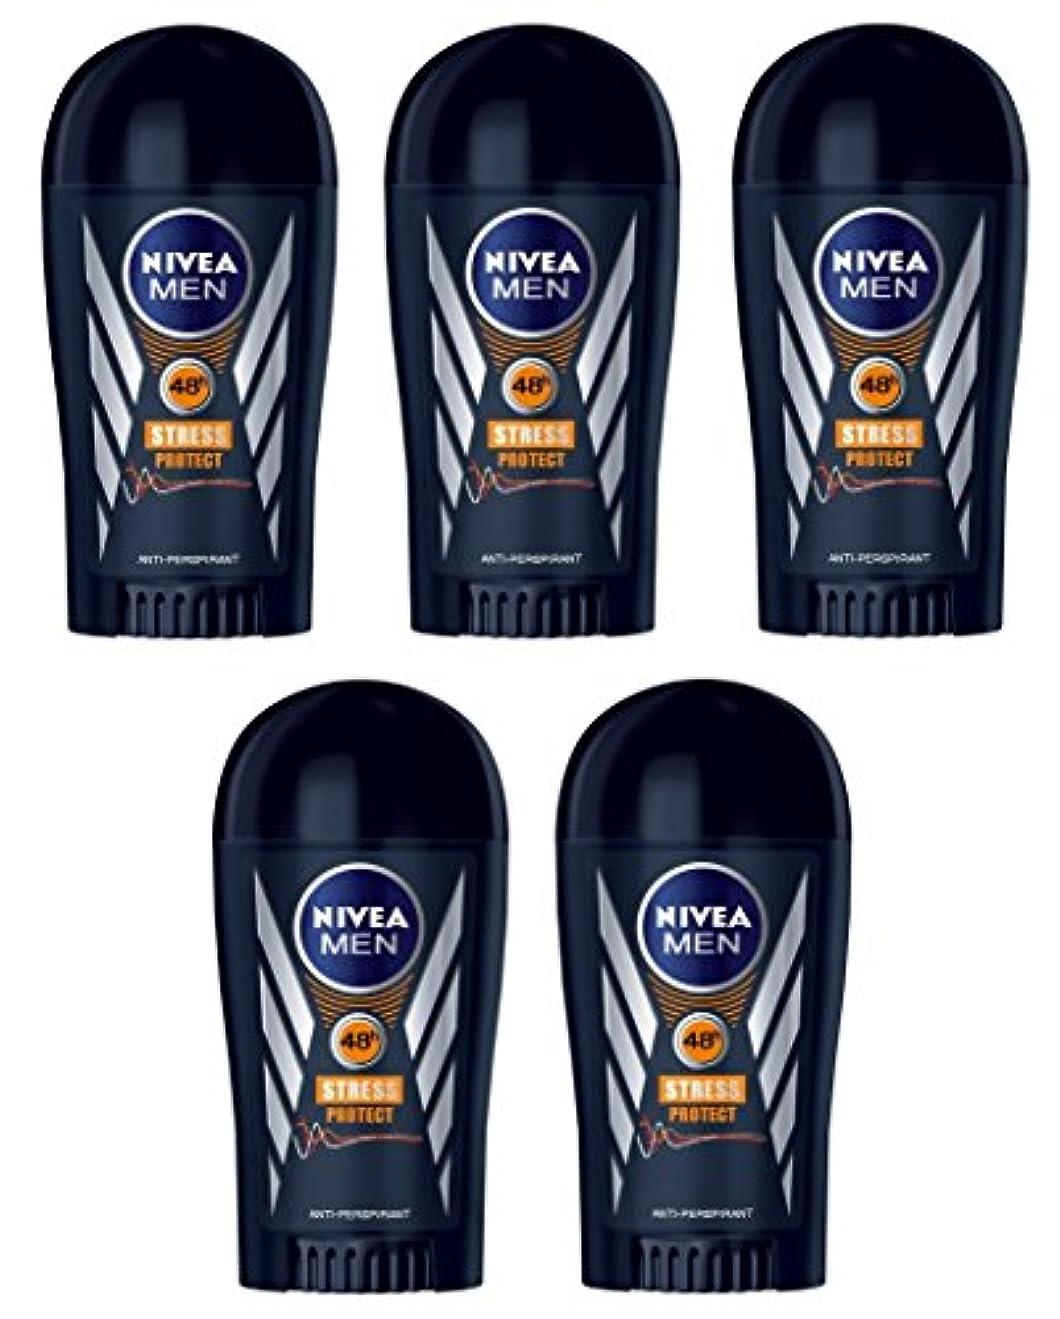 (Pack of 5) Nivea Stress Protect Anti-perspirant Deodorant Solid Stick for Men 5x40ml - (5パック) ニベア応力プロテクト制汗剤デオドラントスティック...